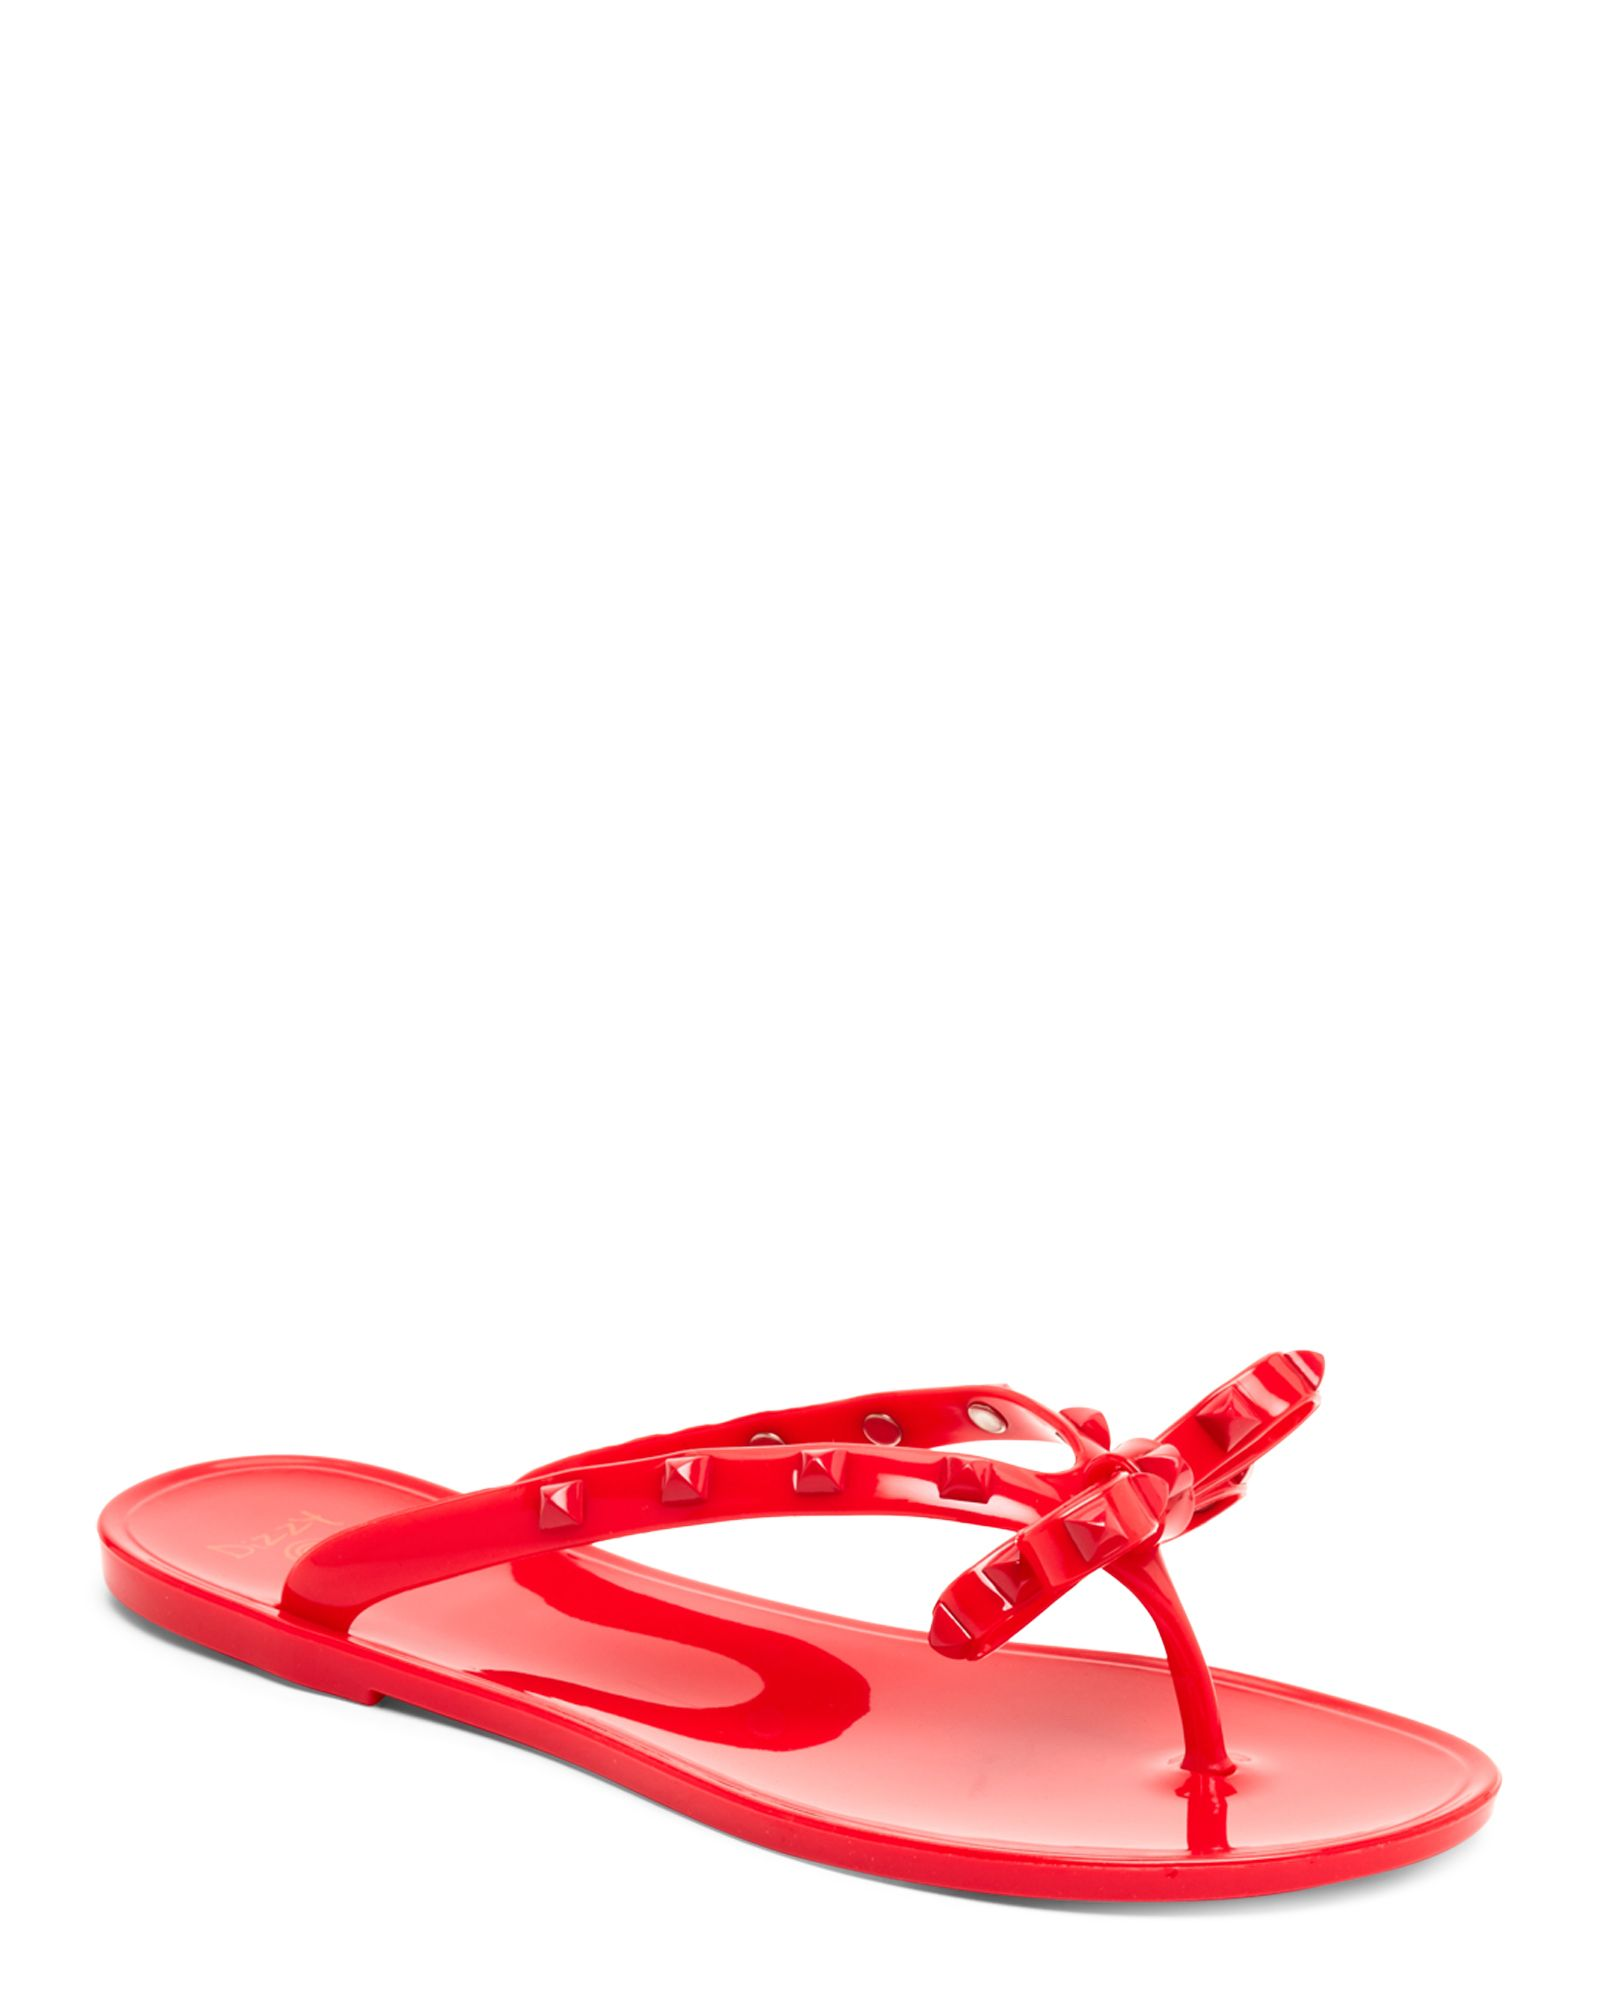 89ca9c5c0fda Dizzy Rivet Studded Jelly Flip-Flops. Dizzy Studded Jelly Flip Flops Bow  Sandals